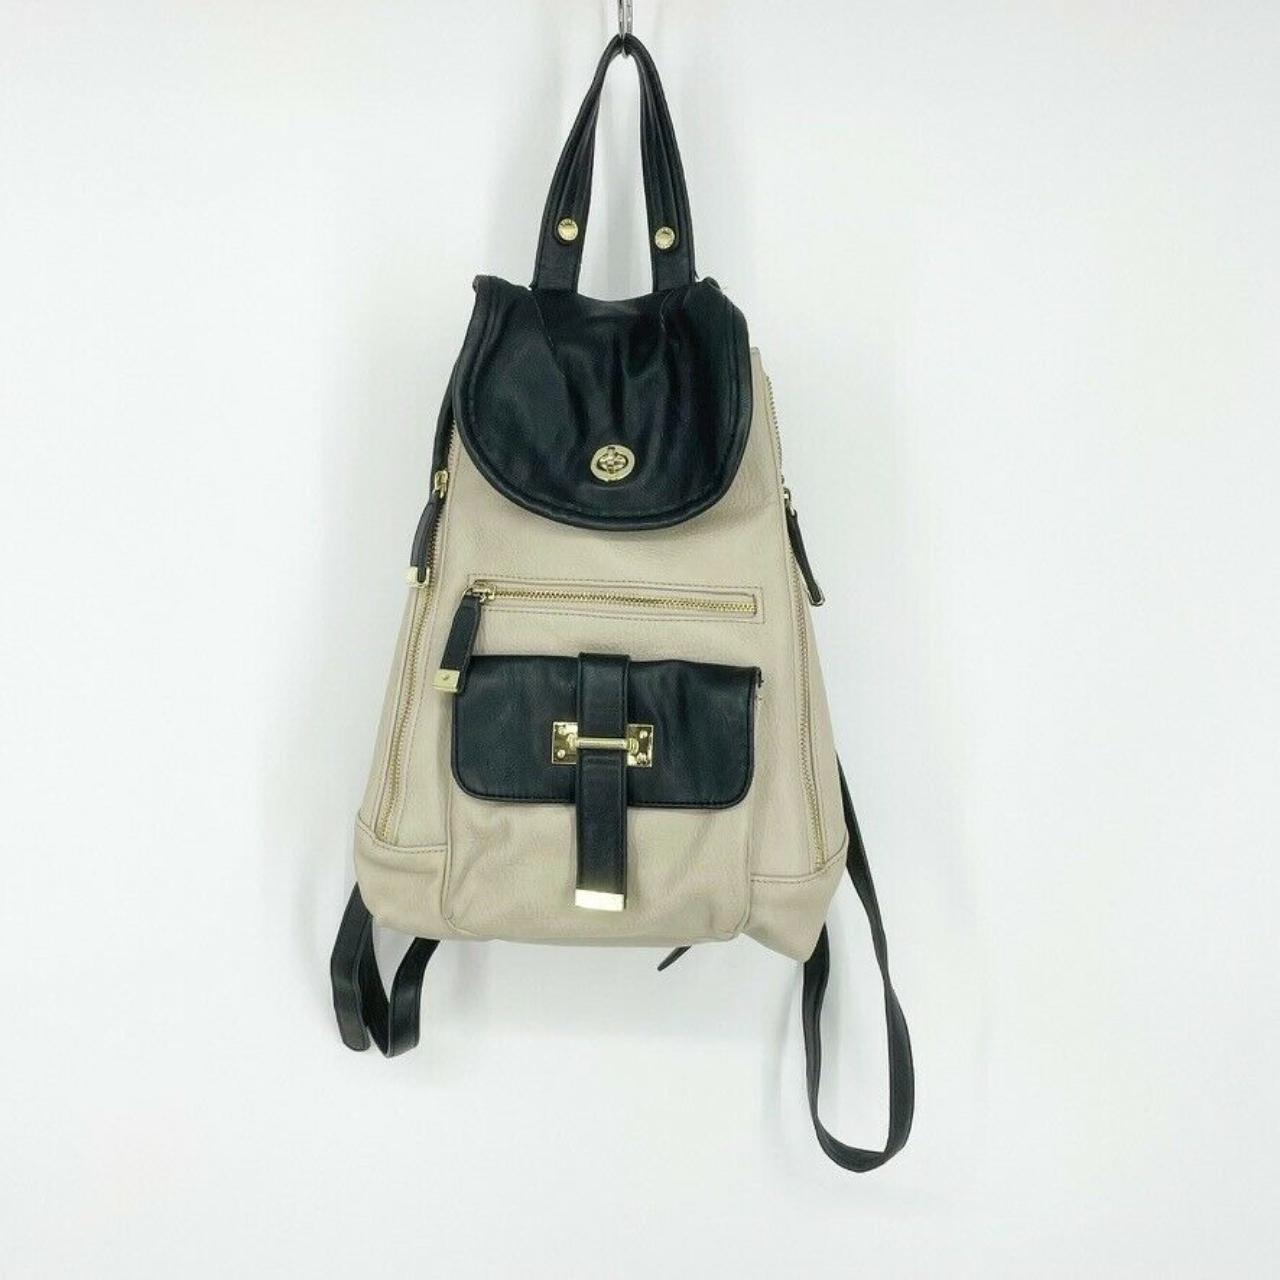 Product Image 1 - Steve Madden Leather Mini Backpack